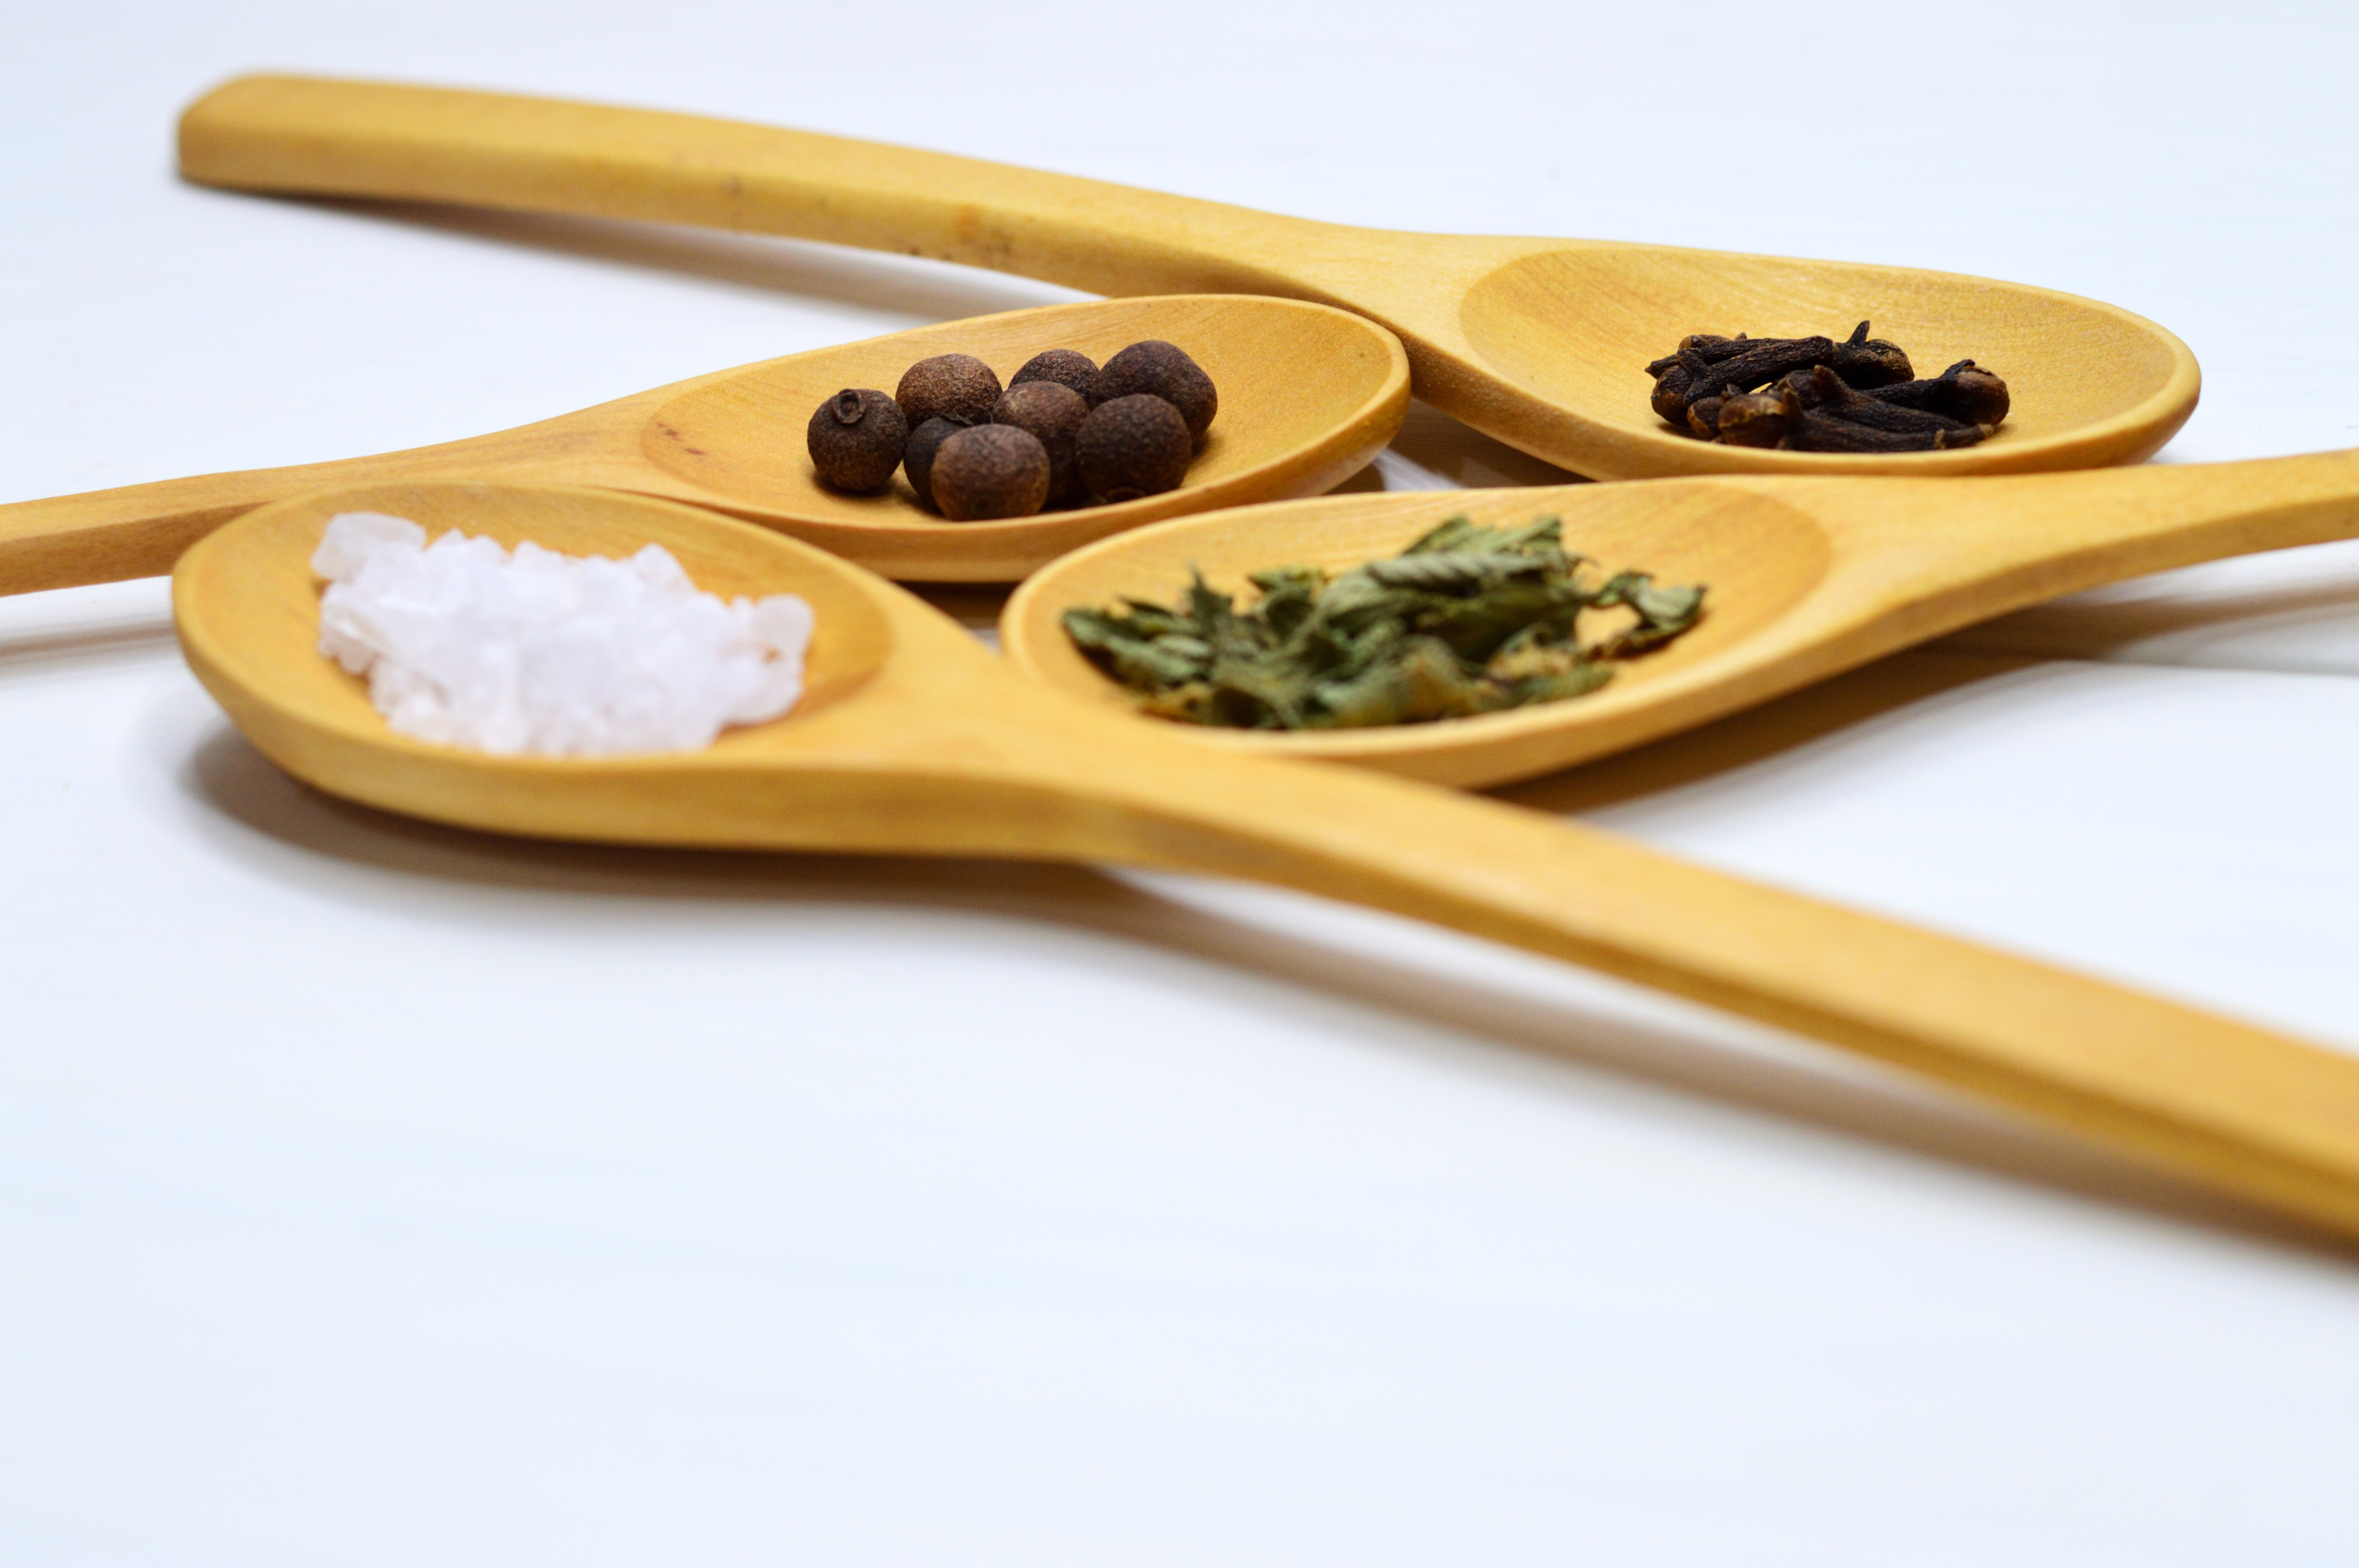 Four brown wooden ladle photo